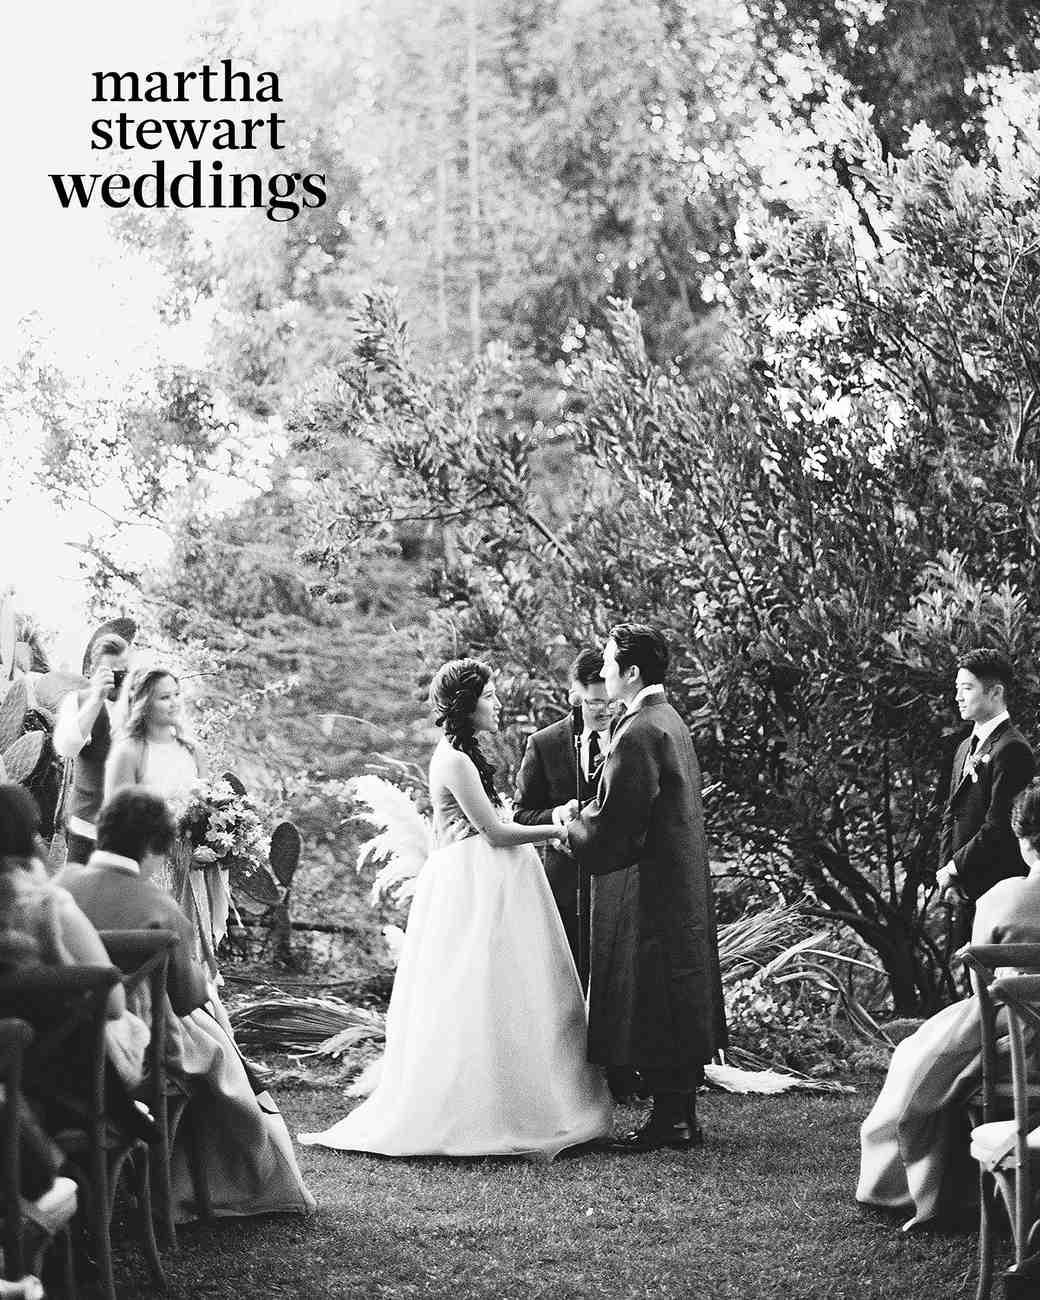 steven yeun walking dead wedding ceremony